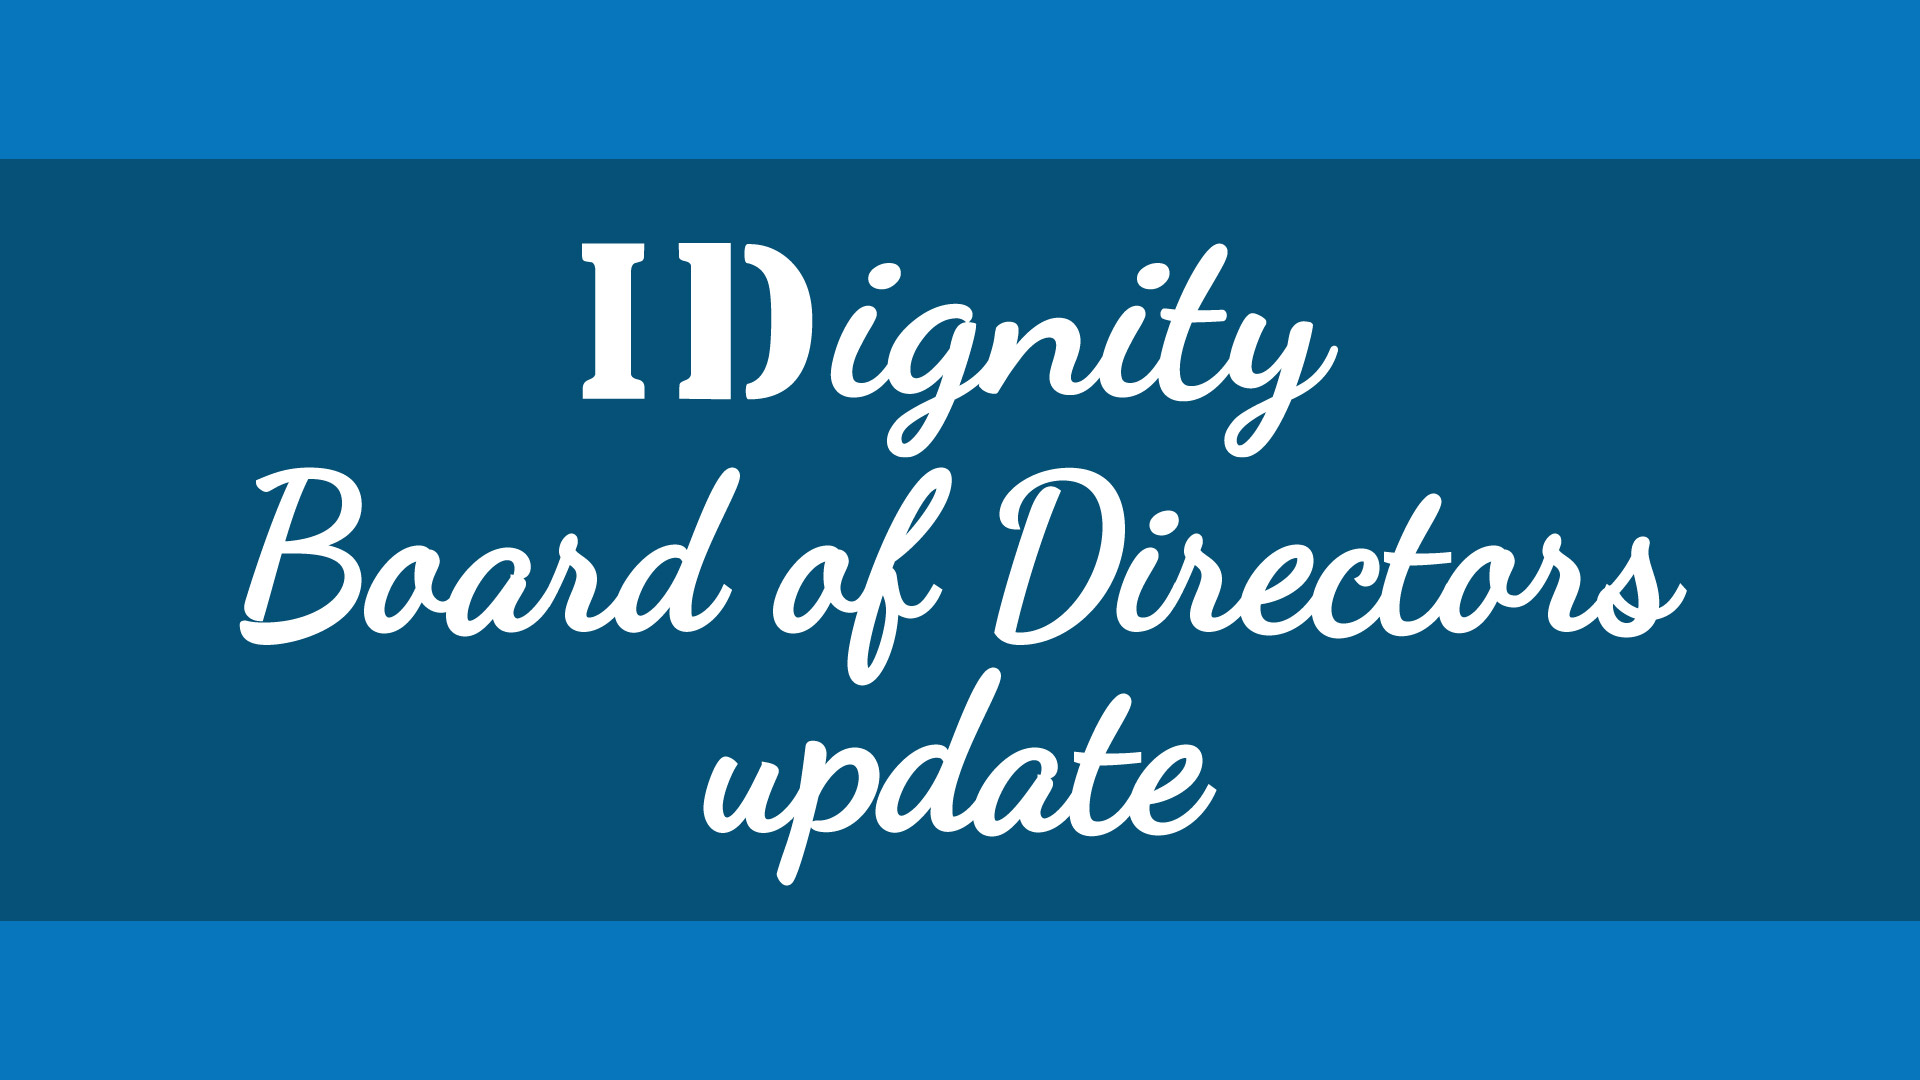 IDignity board of directors update